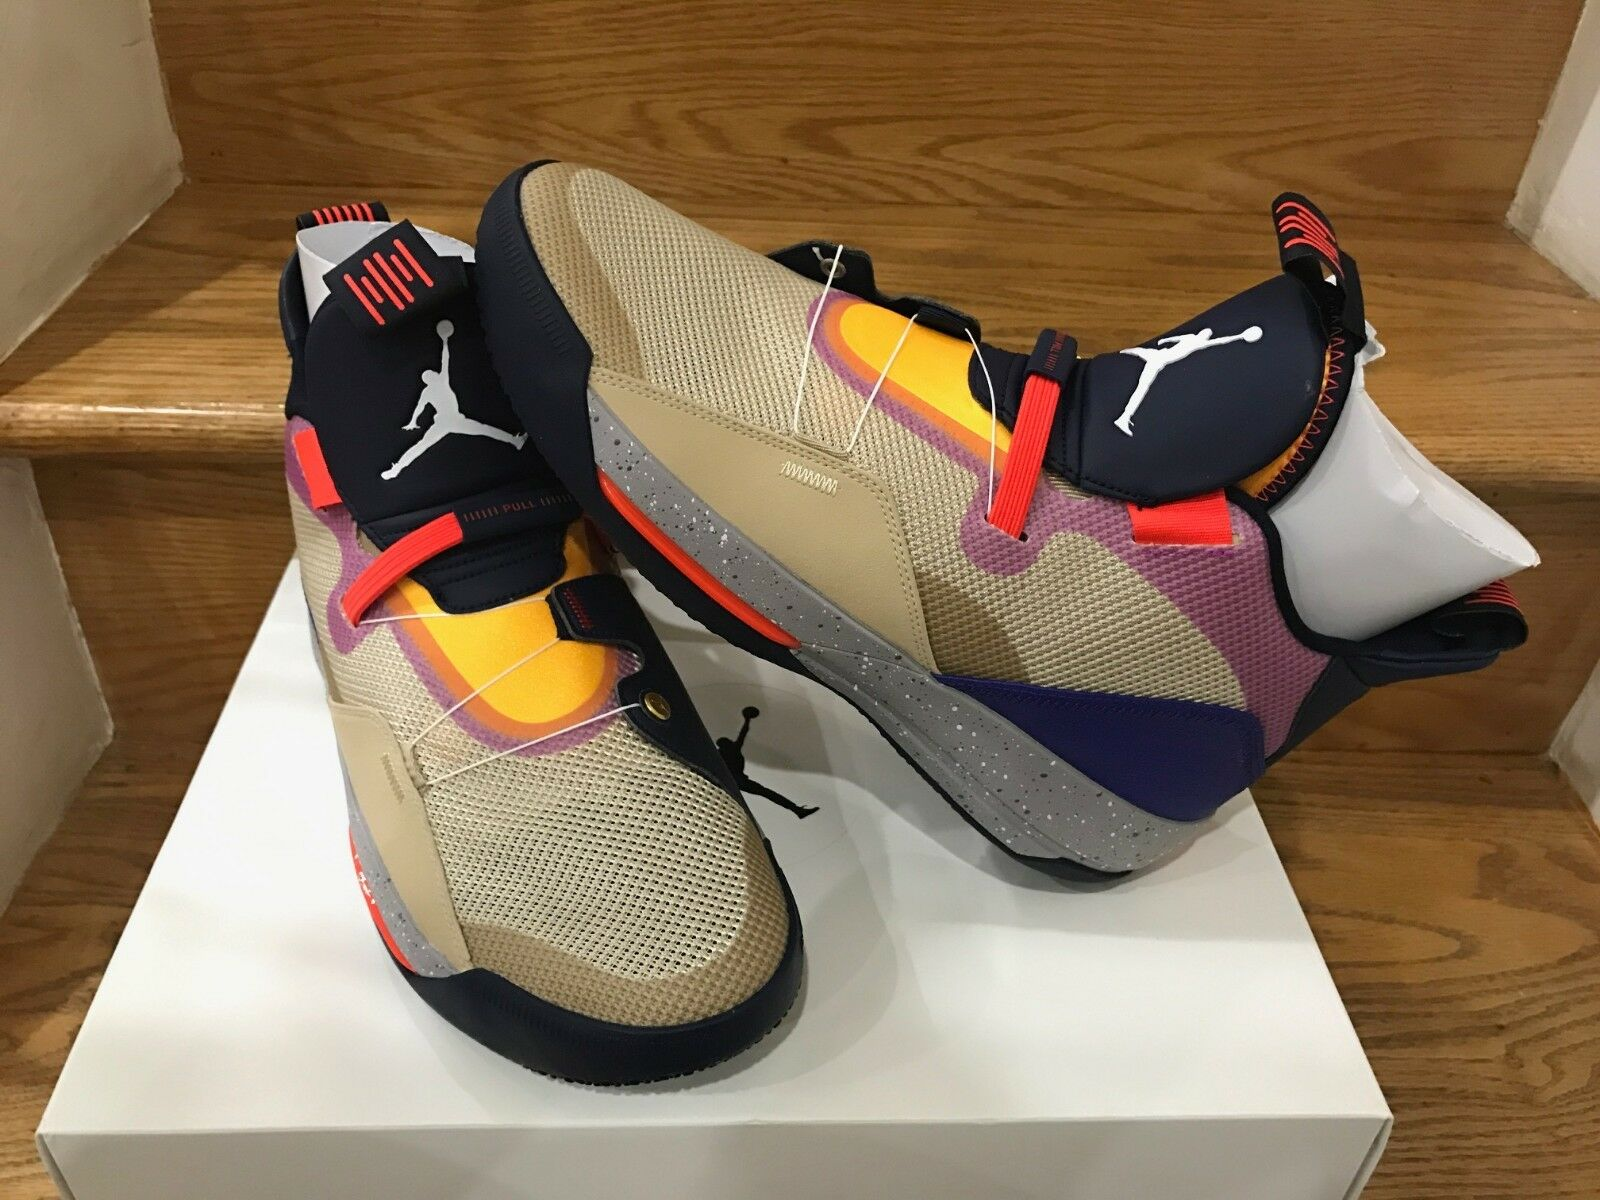 Nike Air Jordan 33 XXXIII Visible Utility Particle Beige Size 8-14 DS AQ883-501